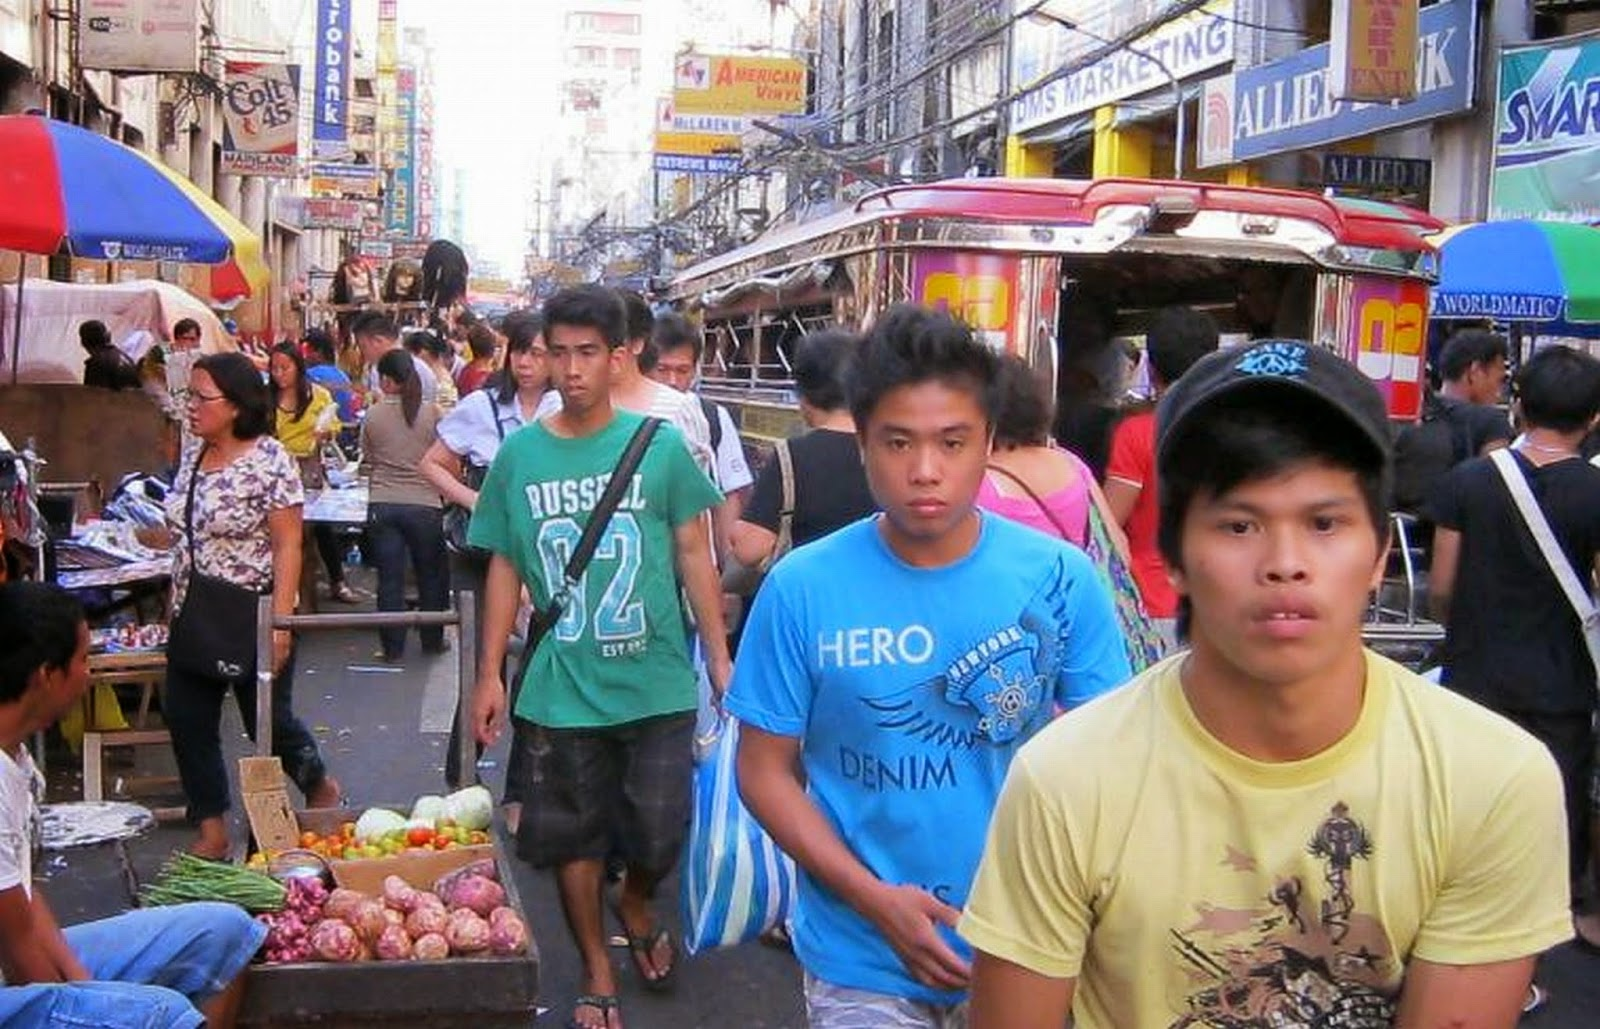 filipino people and juan luna surprise essay